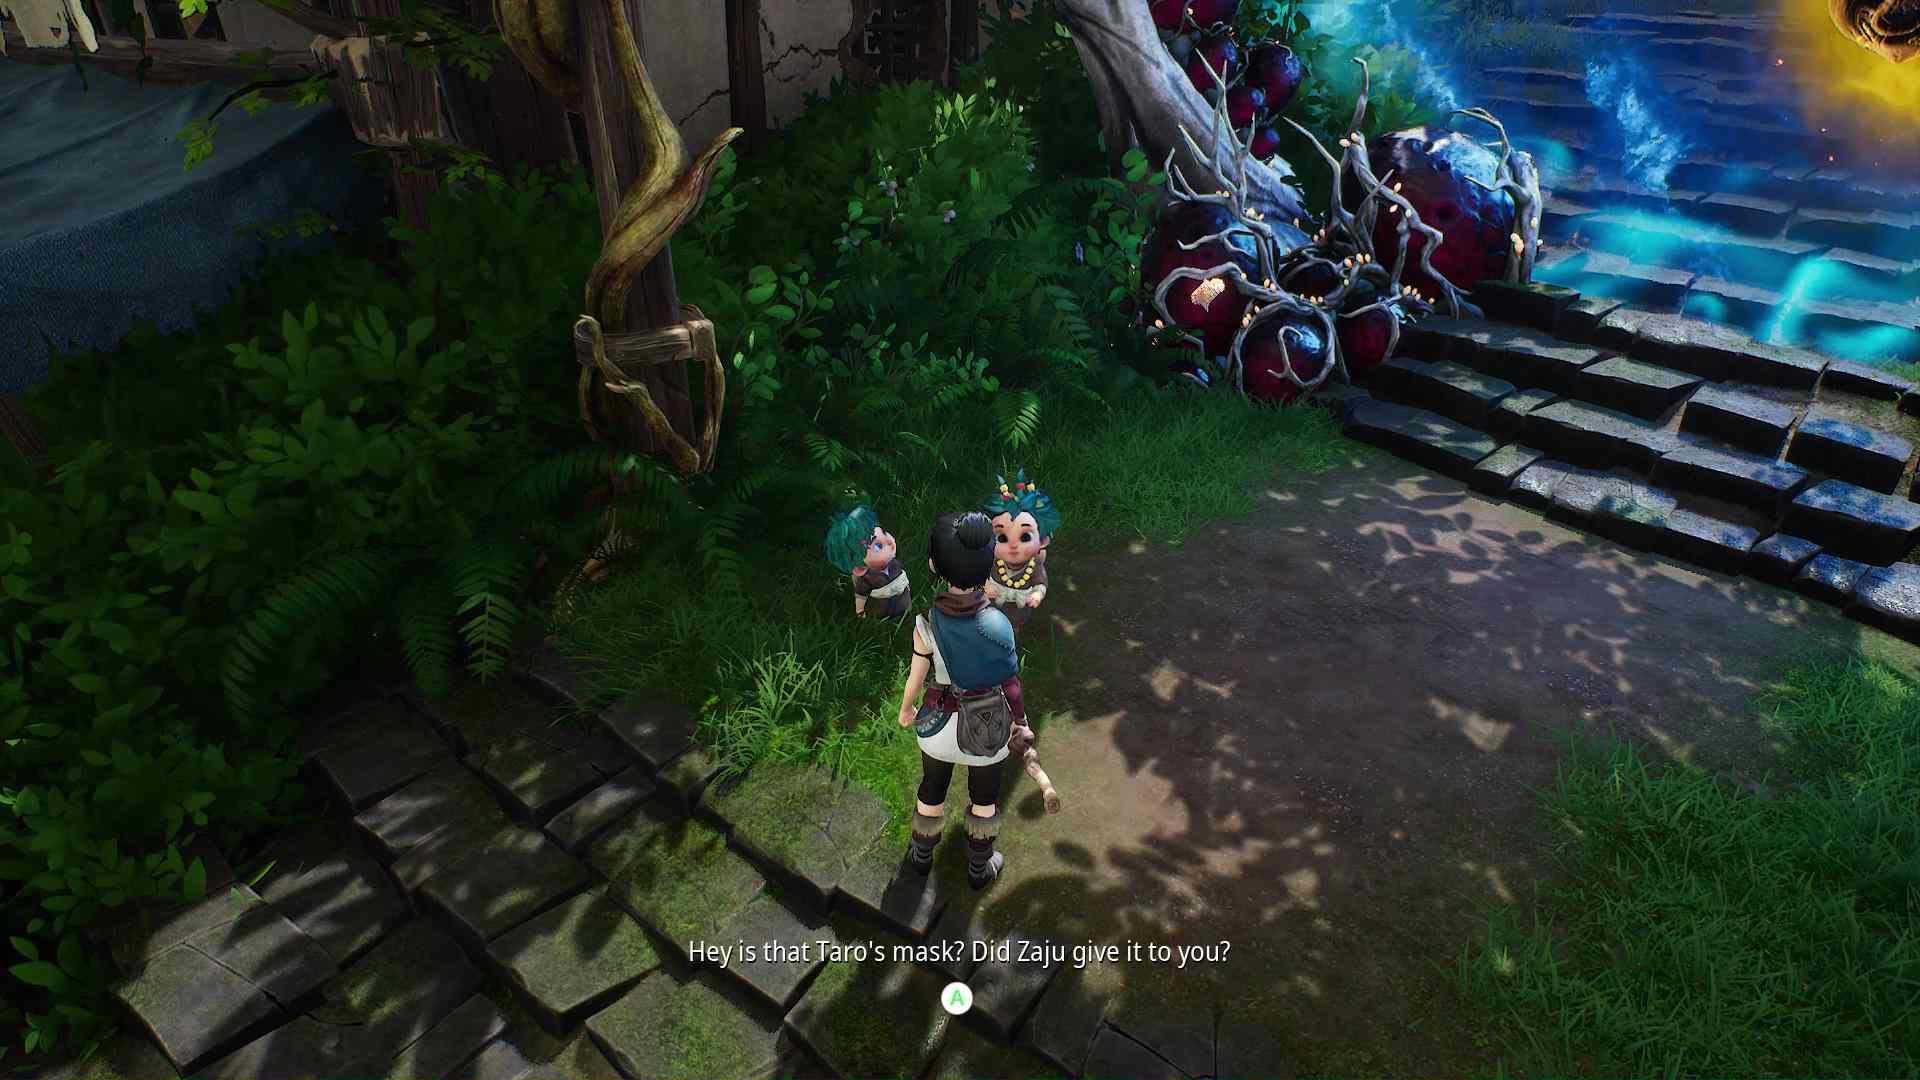 A screenshot from 'Kena: Bridge of Spirits'